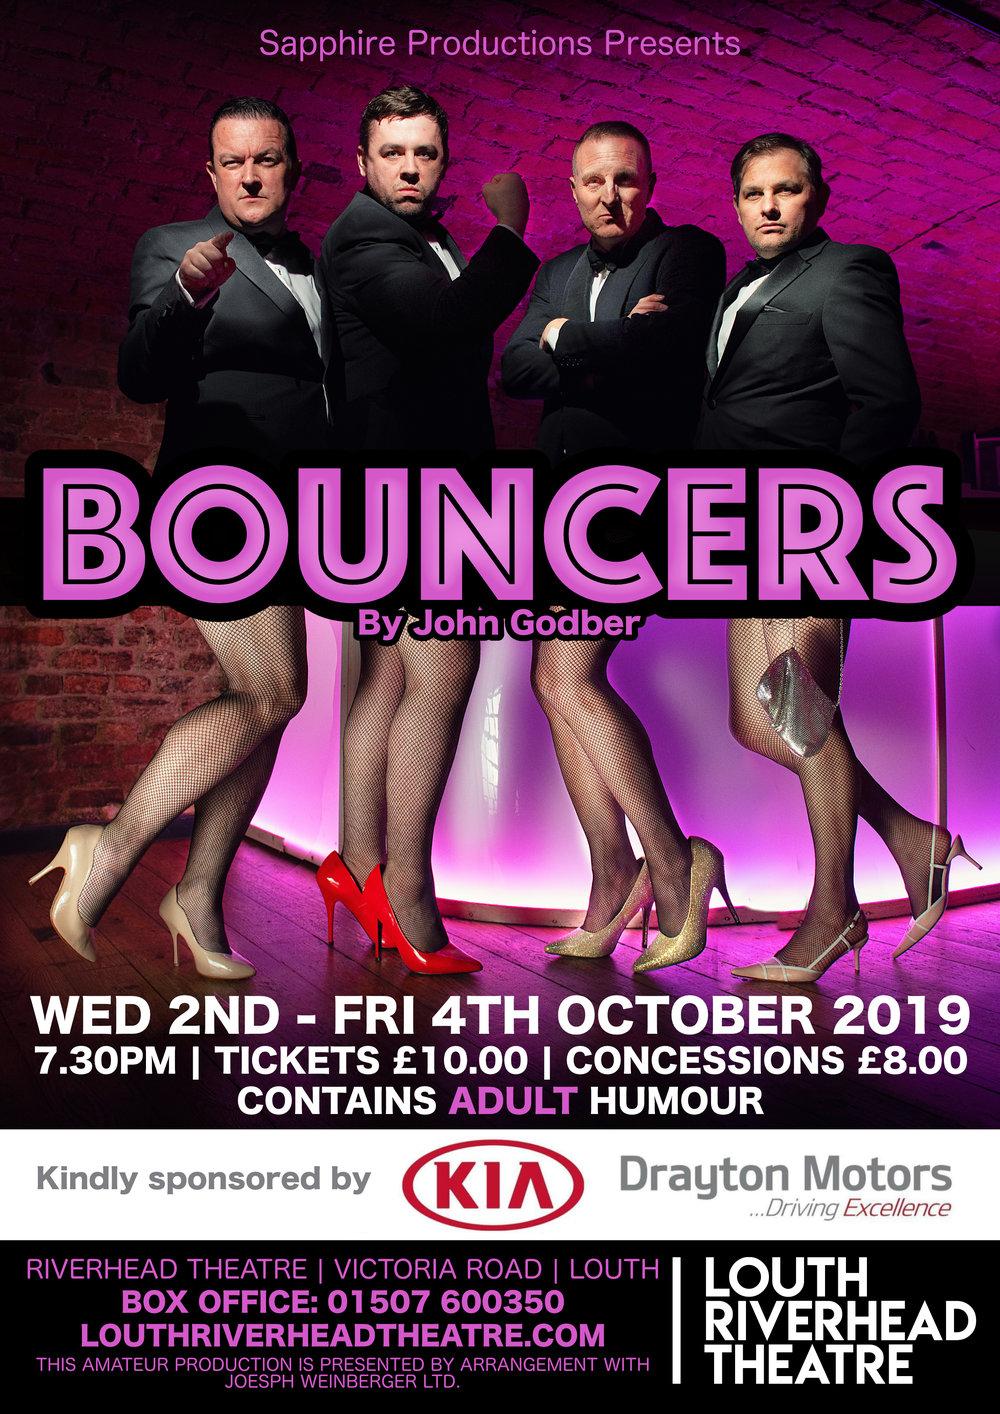 Bouncers Poster.jpg